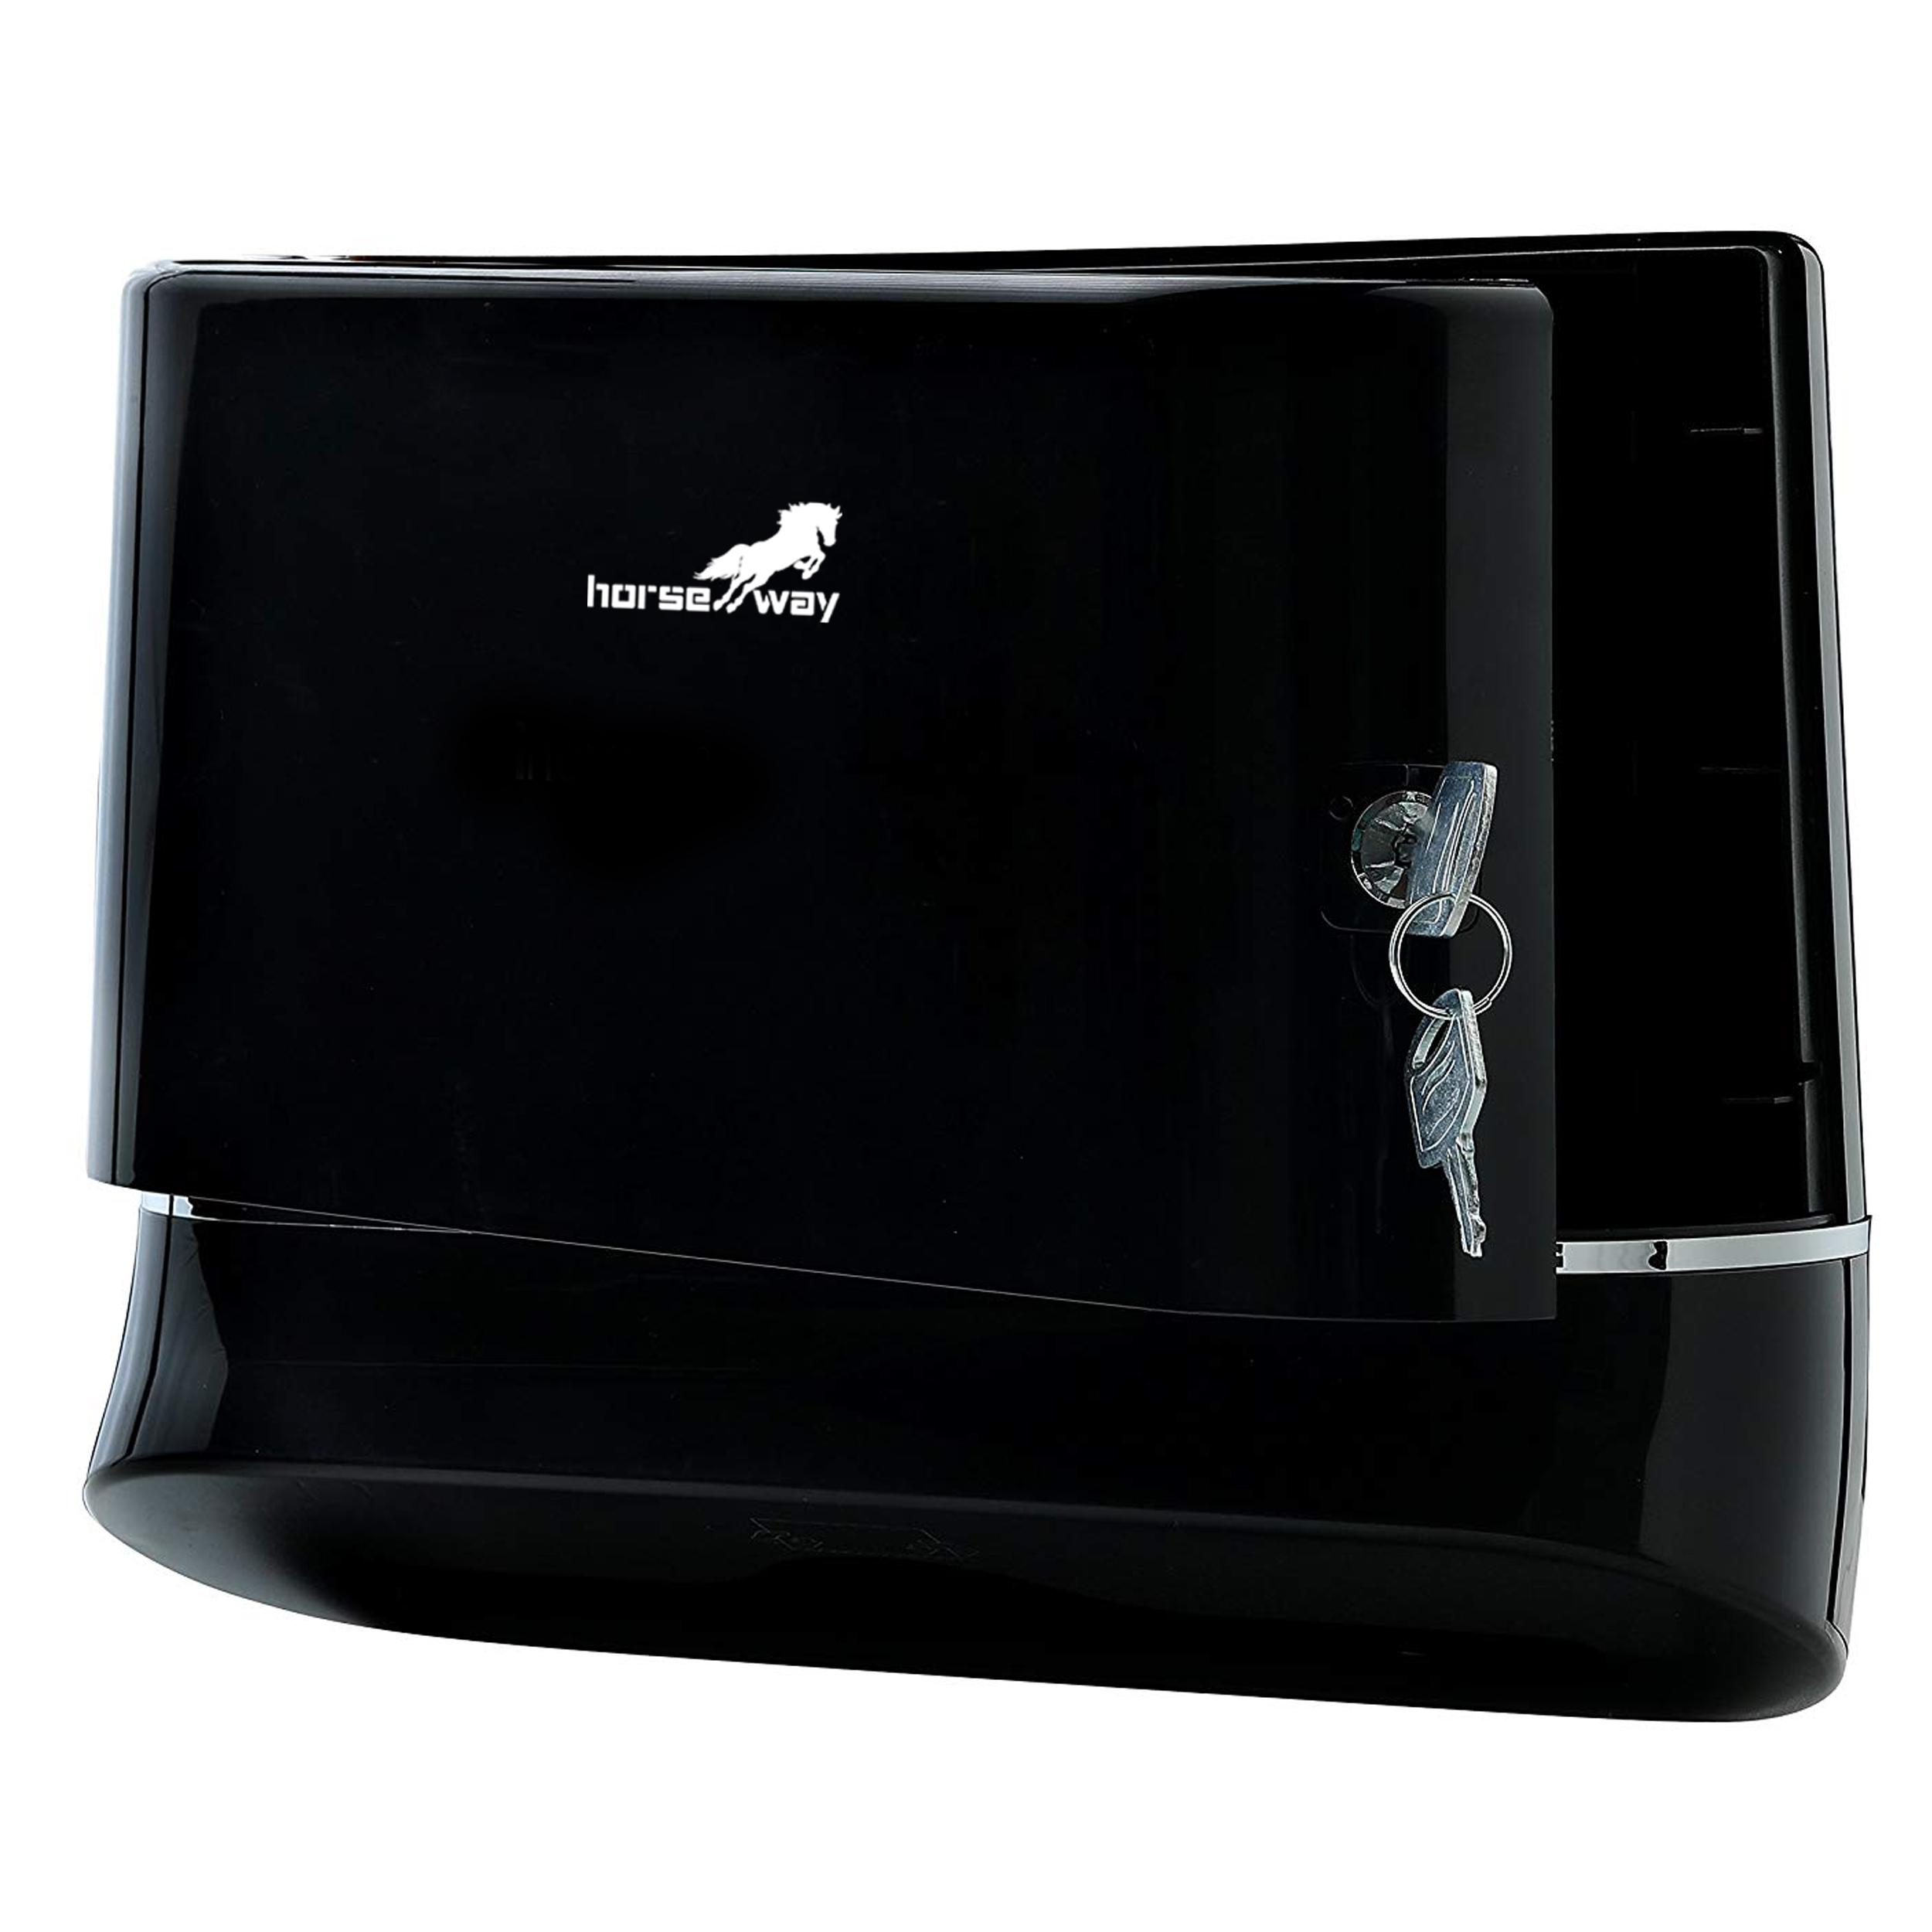 Abs Toilet Paper Dispenser